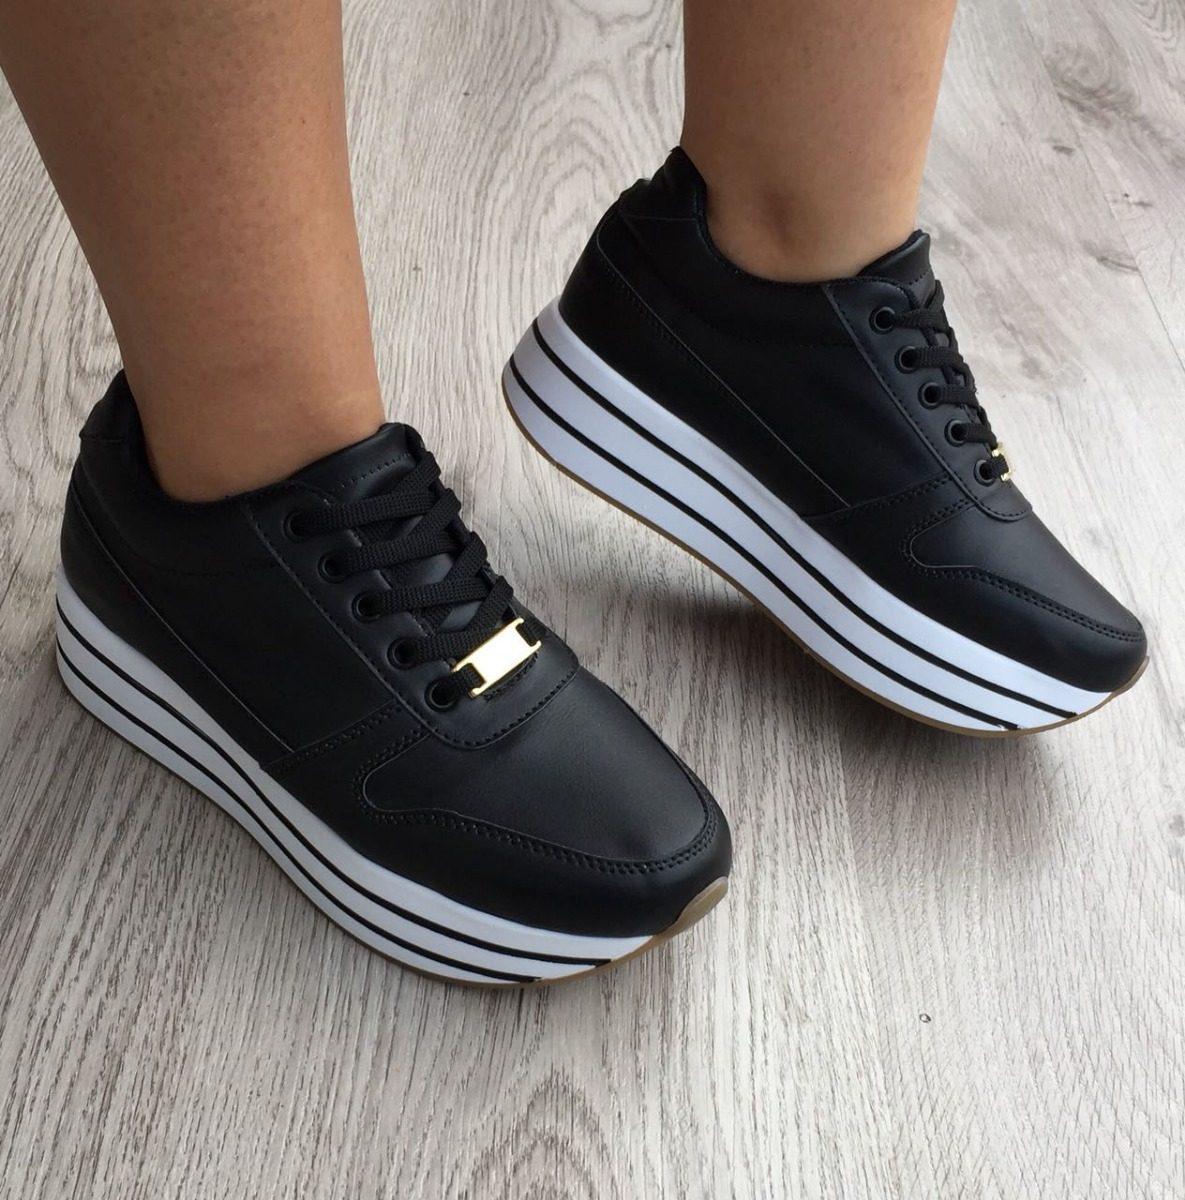 nuevo concepto 82bbb 5ae5a Calzado Para Mujer Tenis Negro Zapatos A La Moda Femenina